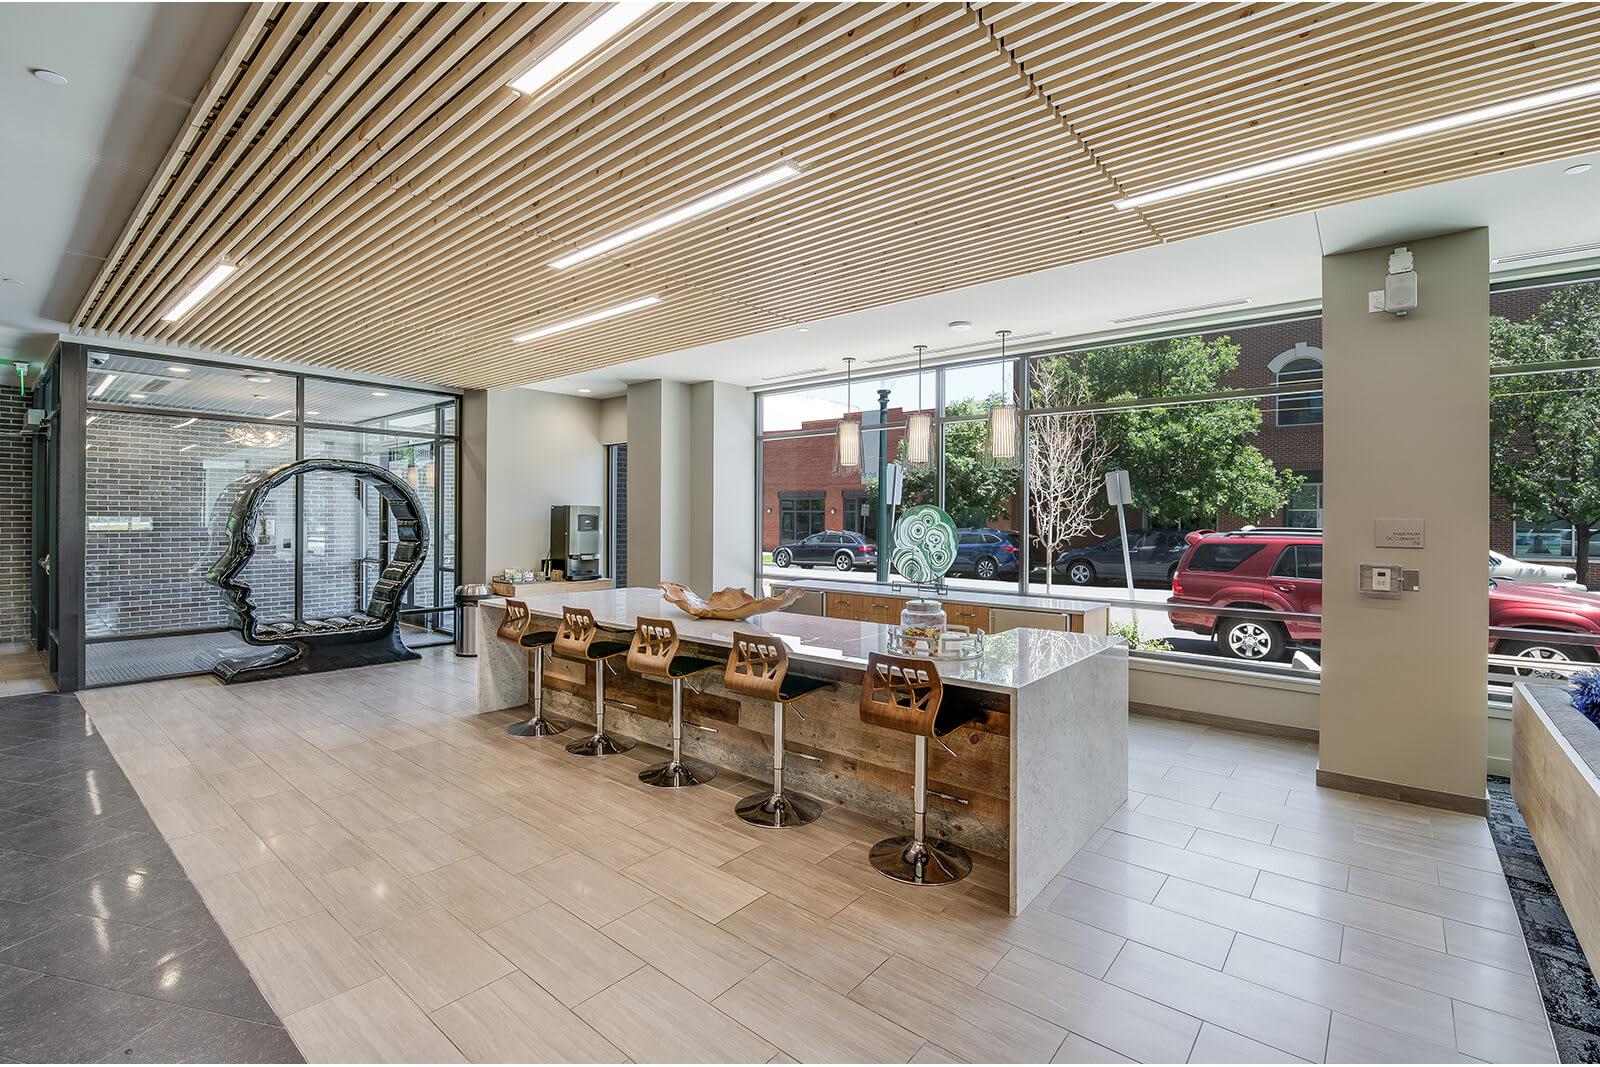 Expansive Indoor and Outdoor Amenities at 1000 Speer by Windsor, 1000 Speer Blvd., Denver